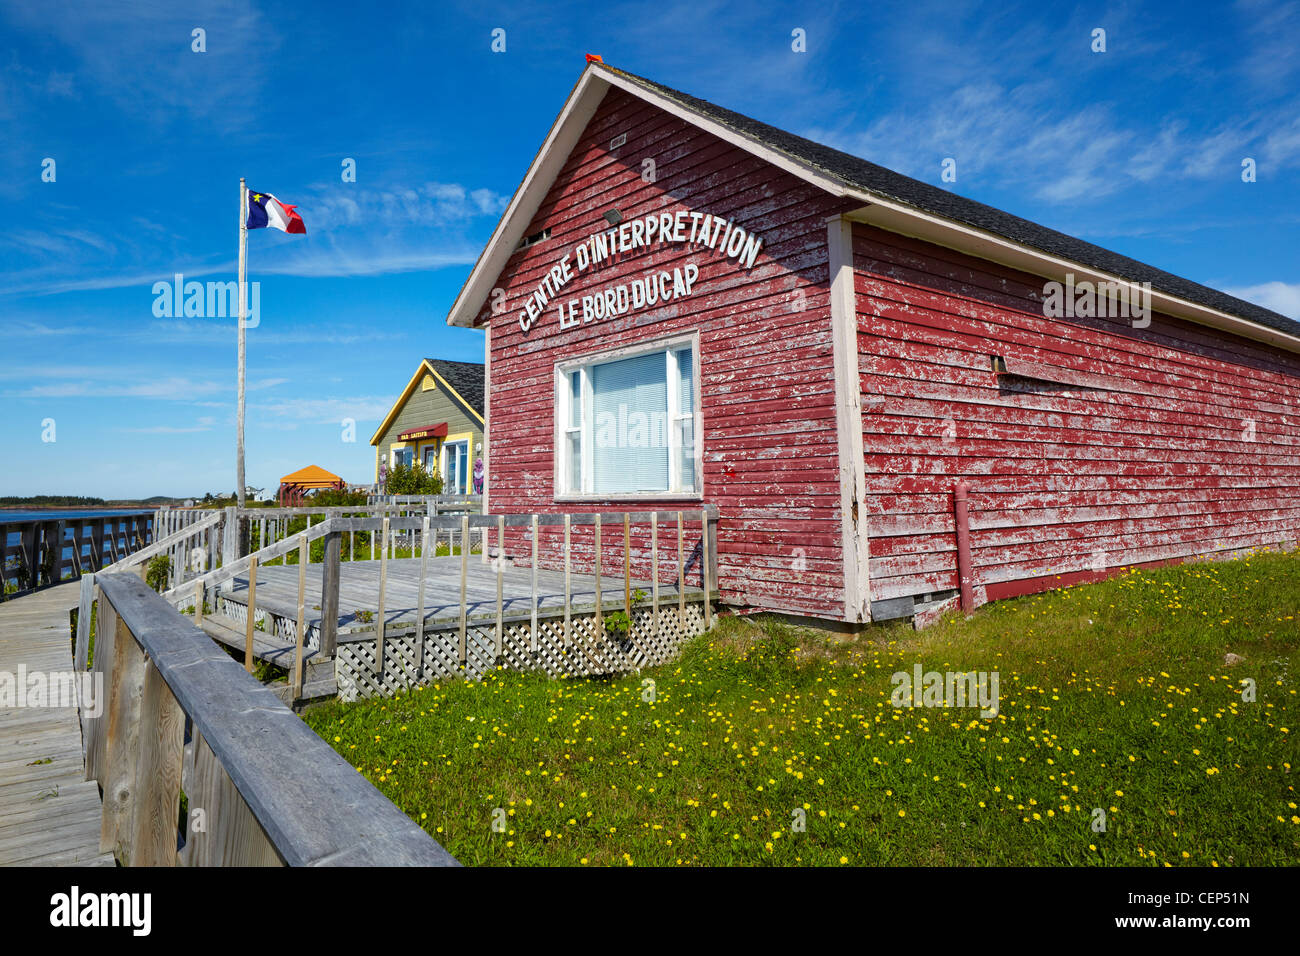 Centre d'interprétation Le Bord du Cap (Interpretation Center), Natashquan, Canada - Stock Image